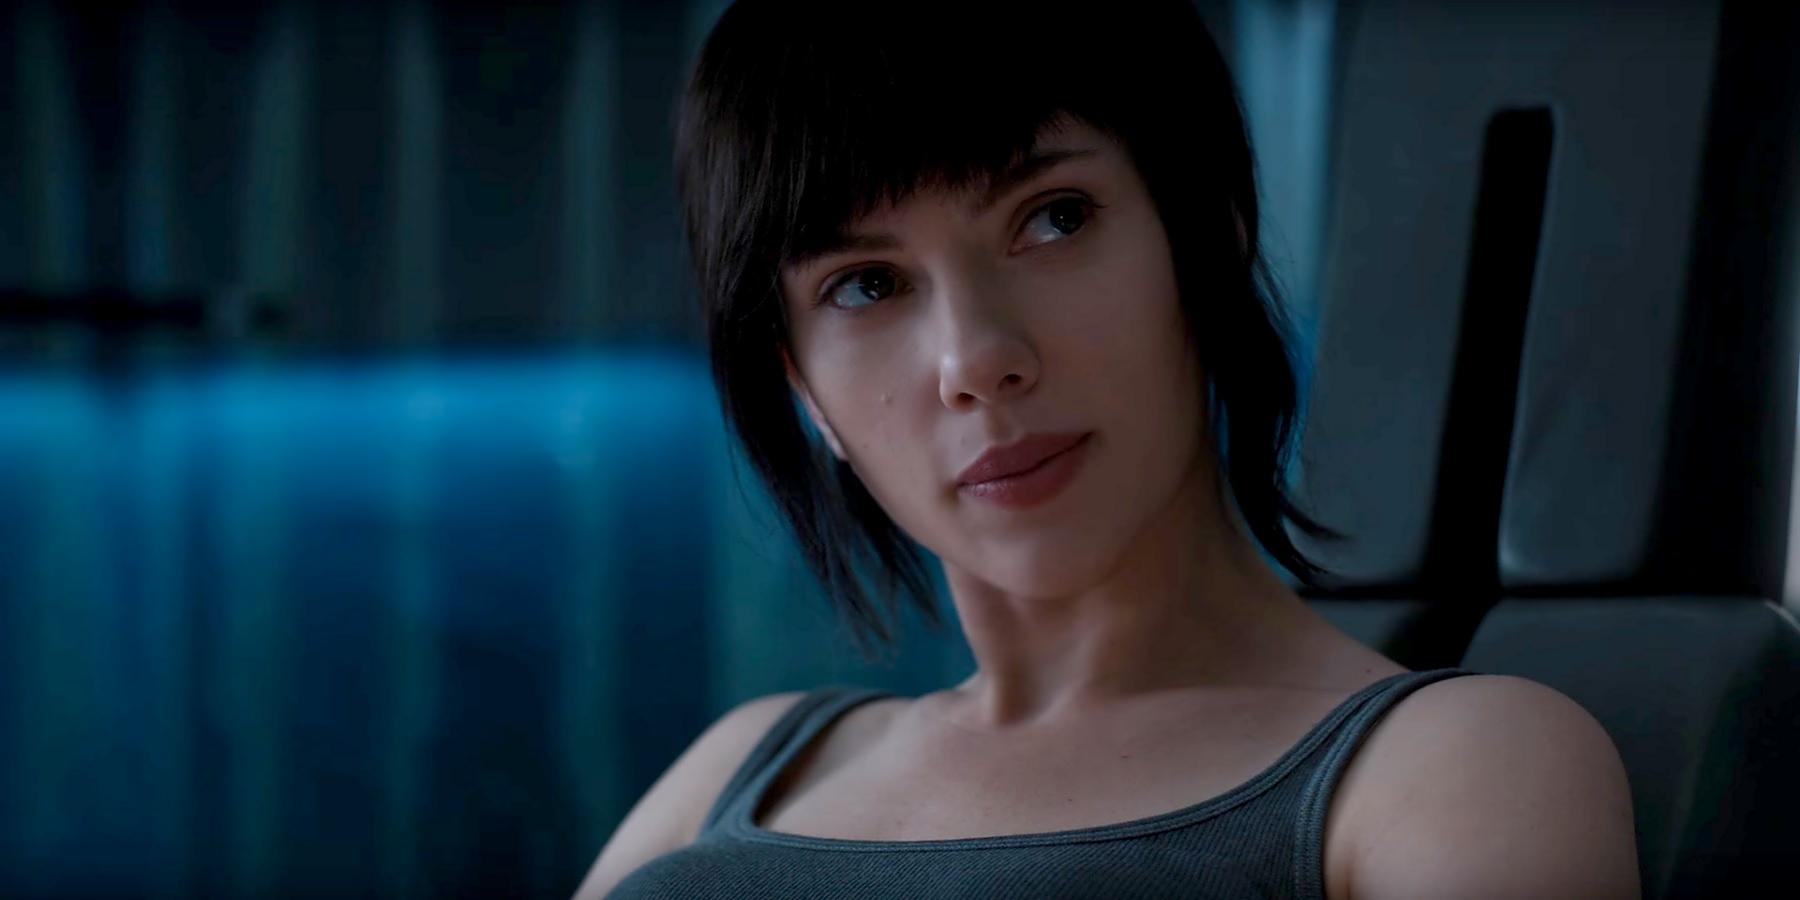 Ghost in the Shell International Trailer: More Major Action Scarlett Johansson Filmography